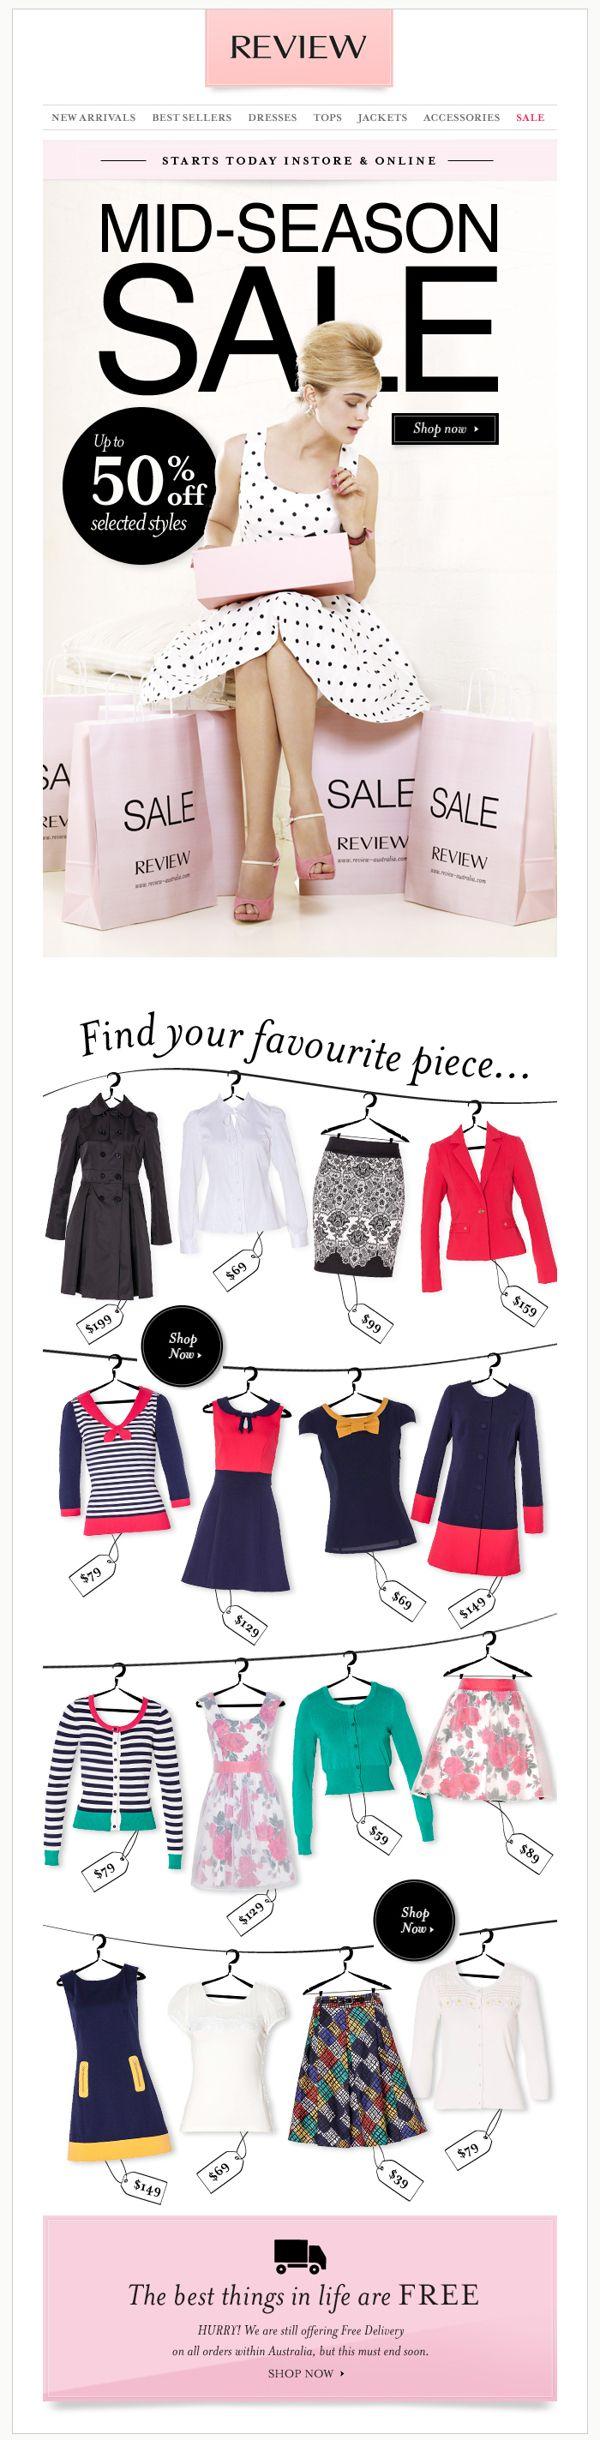 review-australia.com | Weekly eDM/newsletter design by Hollie Bracewell, via…